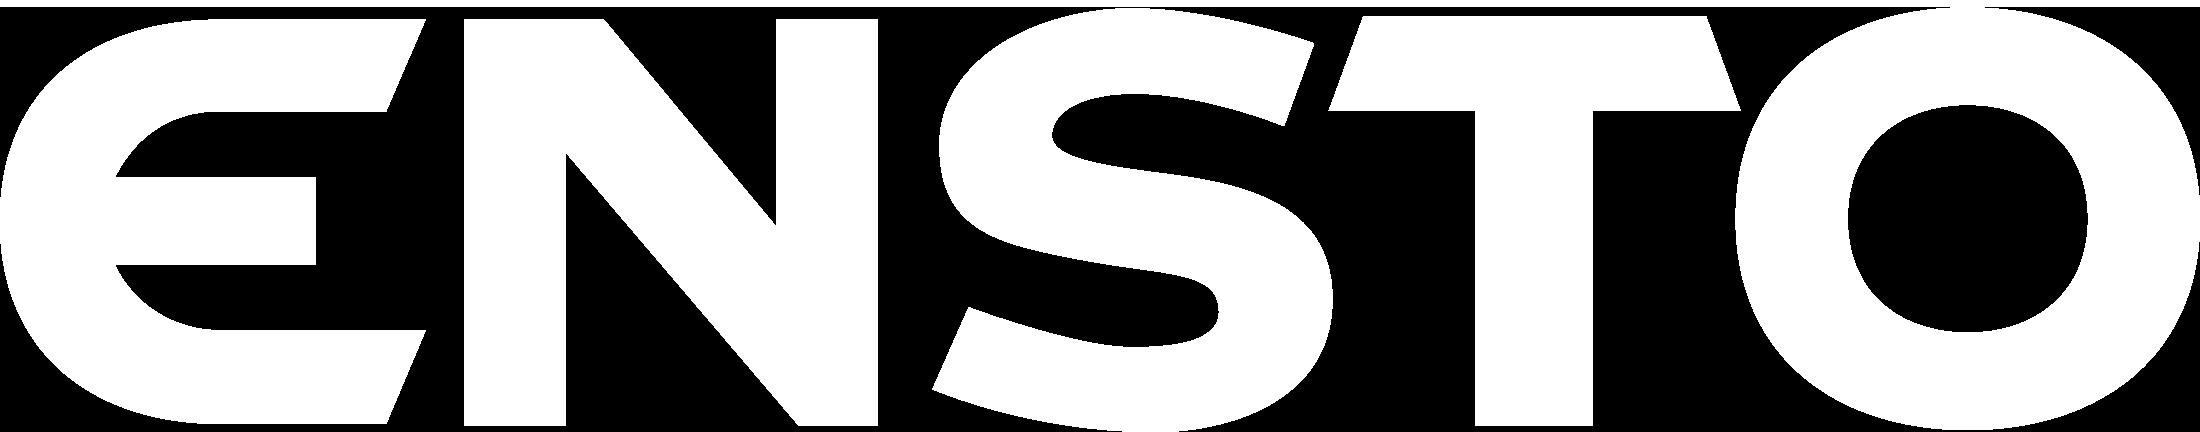 Renley Logo White